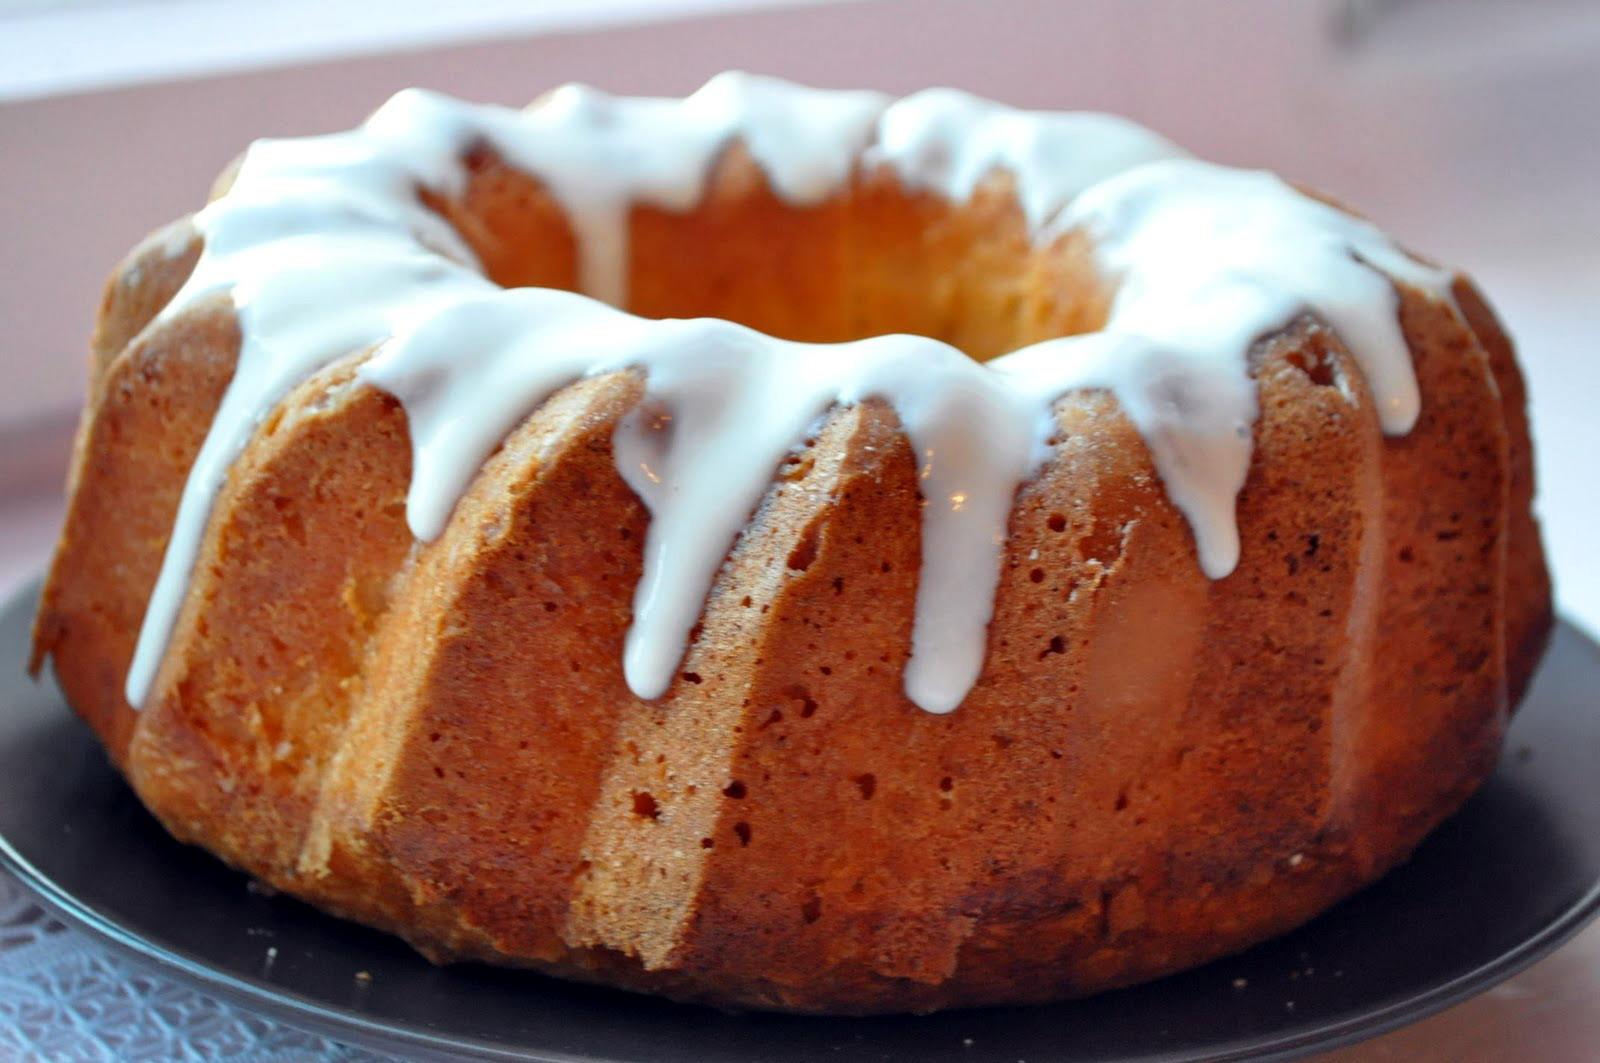 артист кекс большой рецепты с фото правило, фермуар интернете